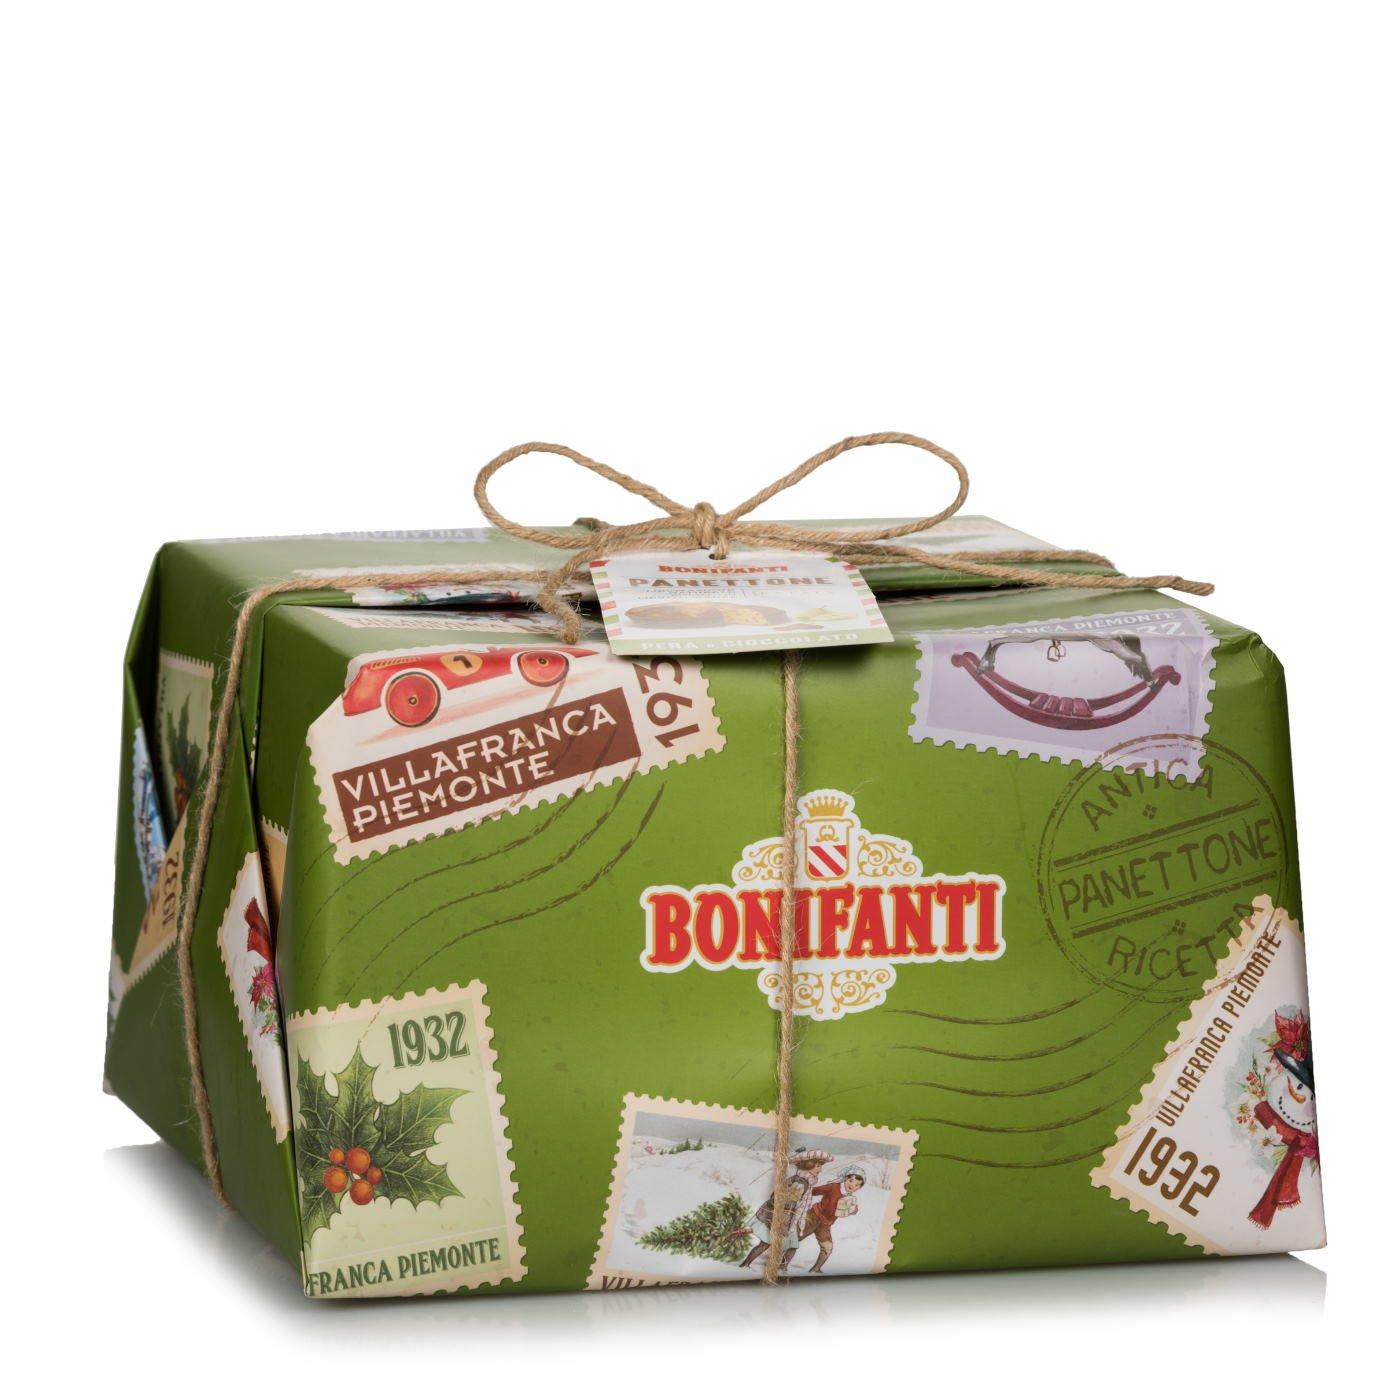 Panettone Birne Und Schokolade 1kg Bonifanti Eataly